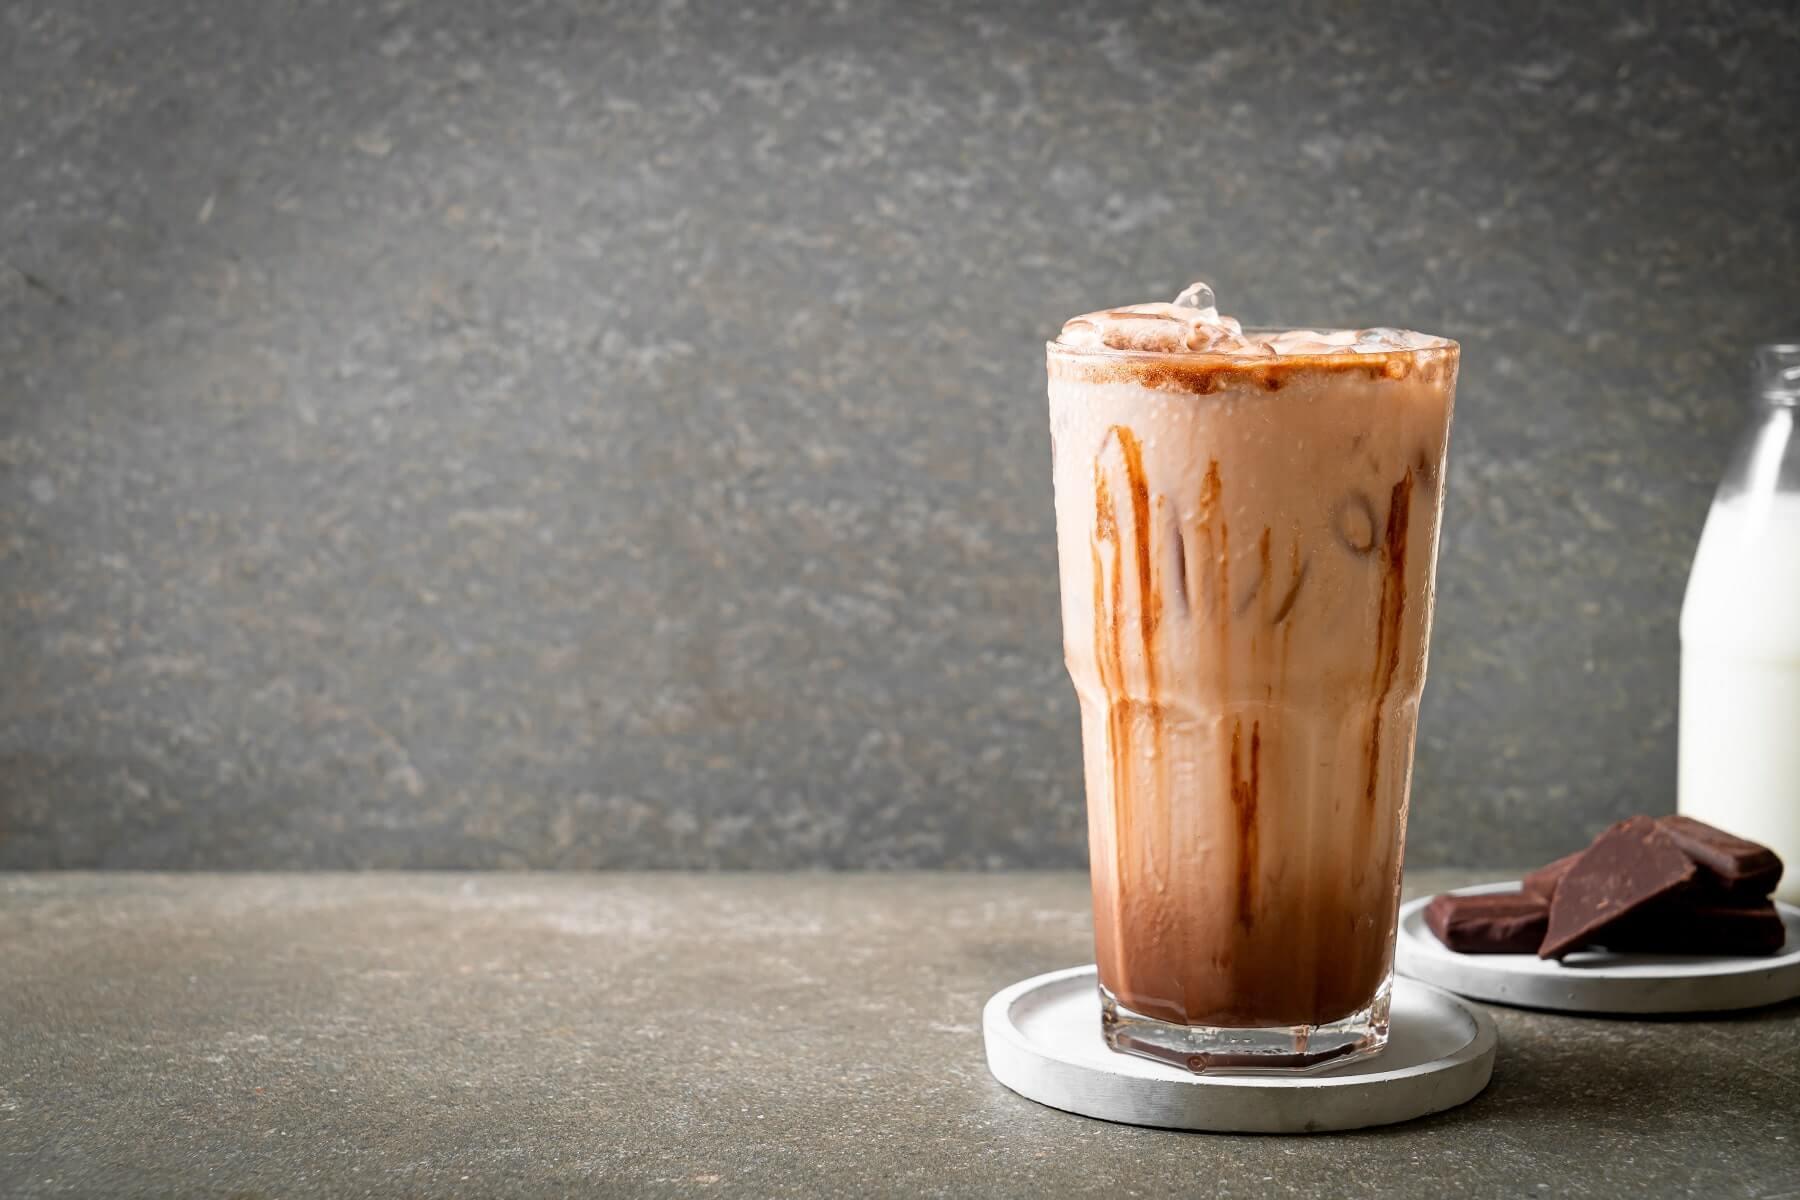 chocolate cold coffee